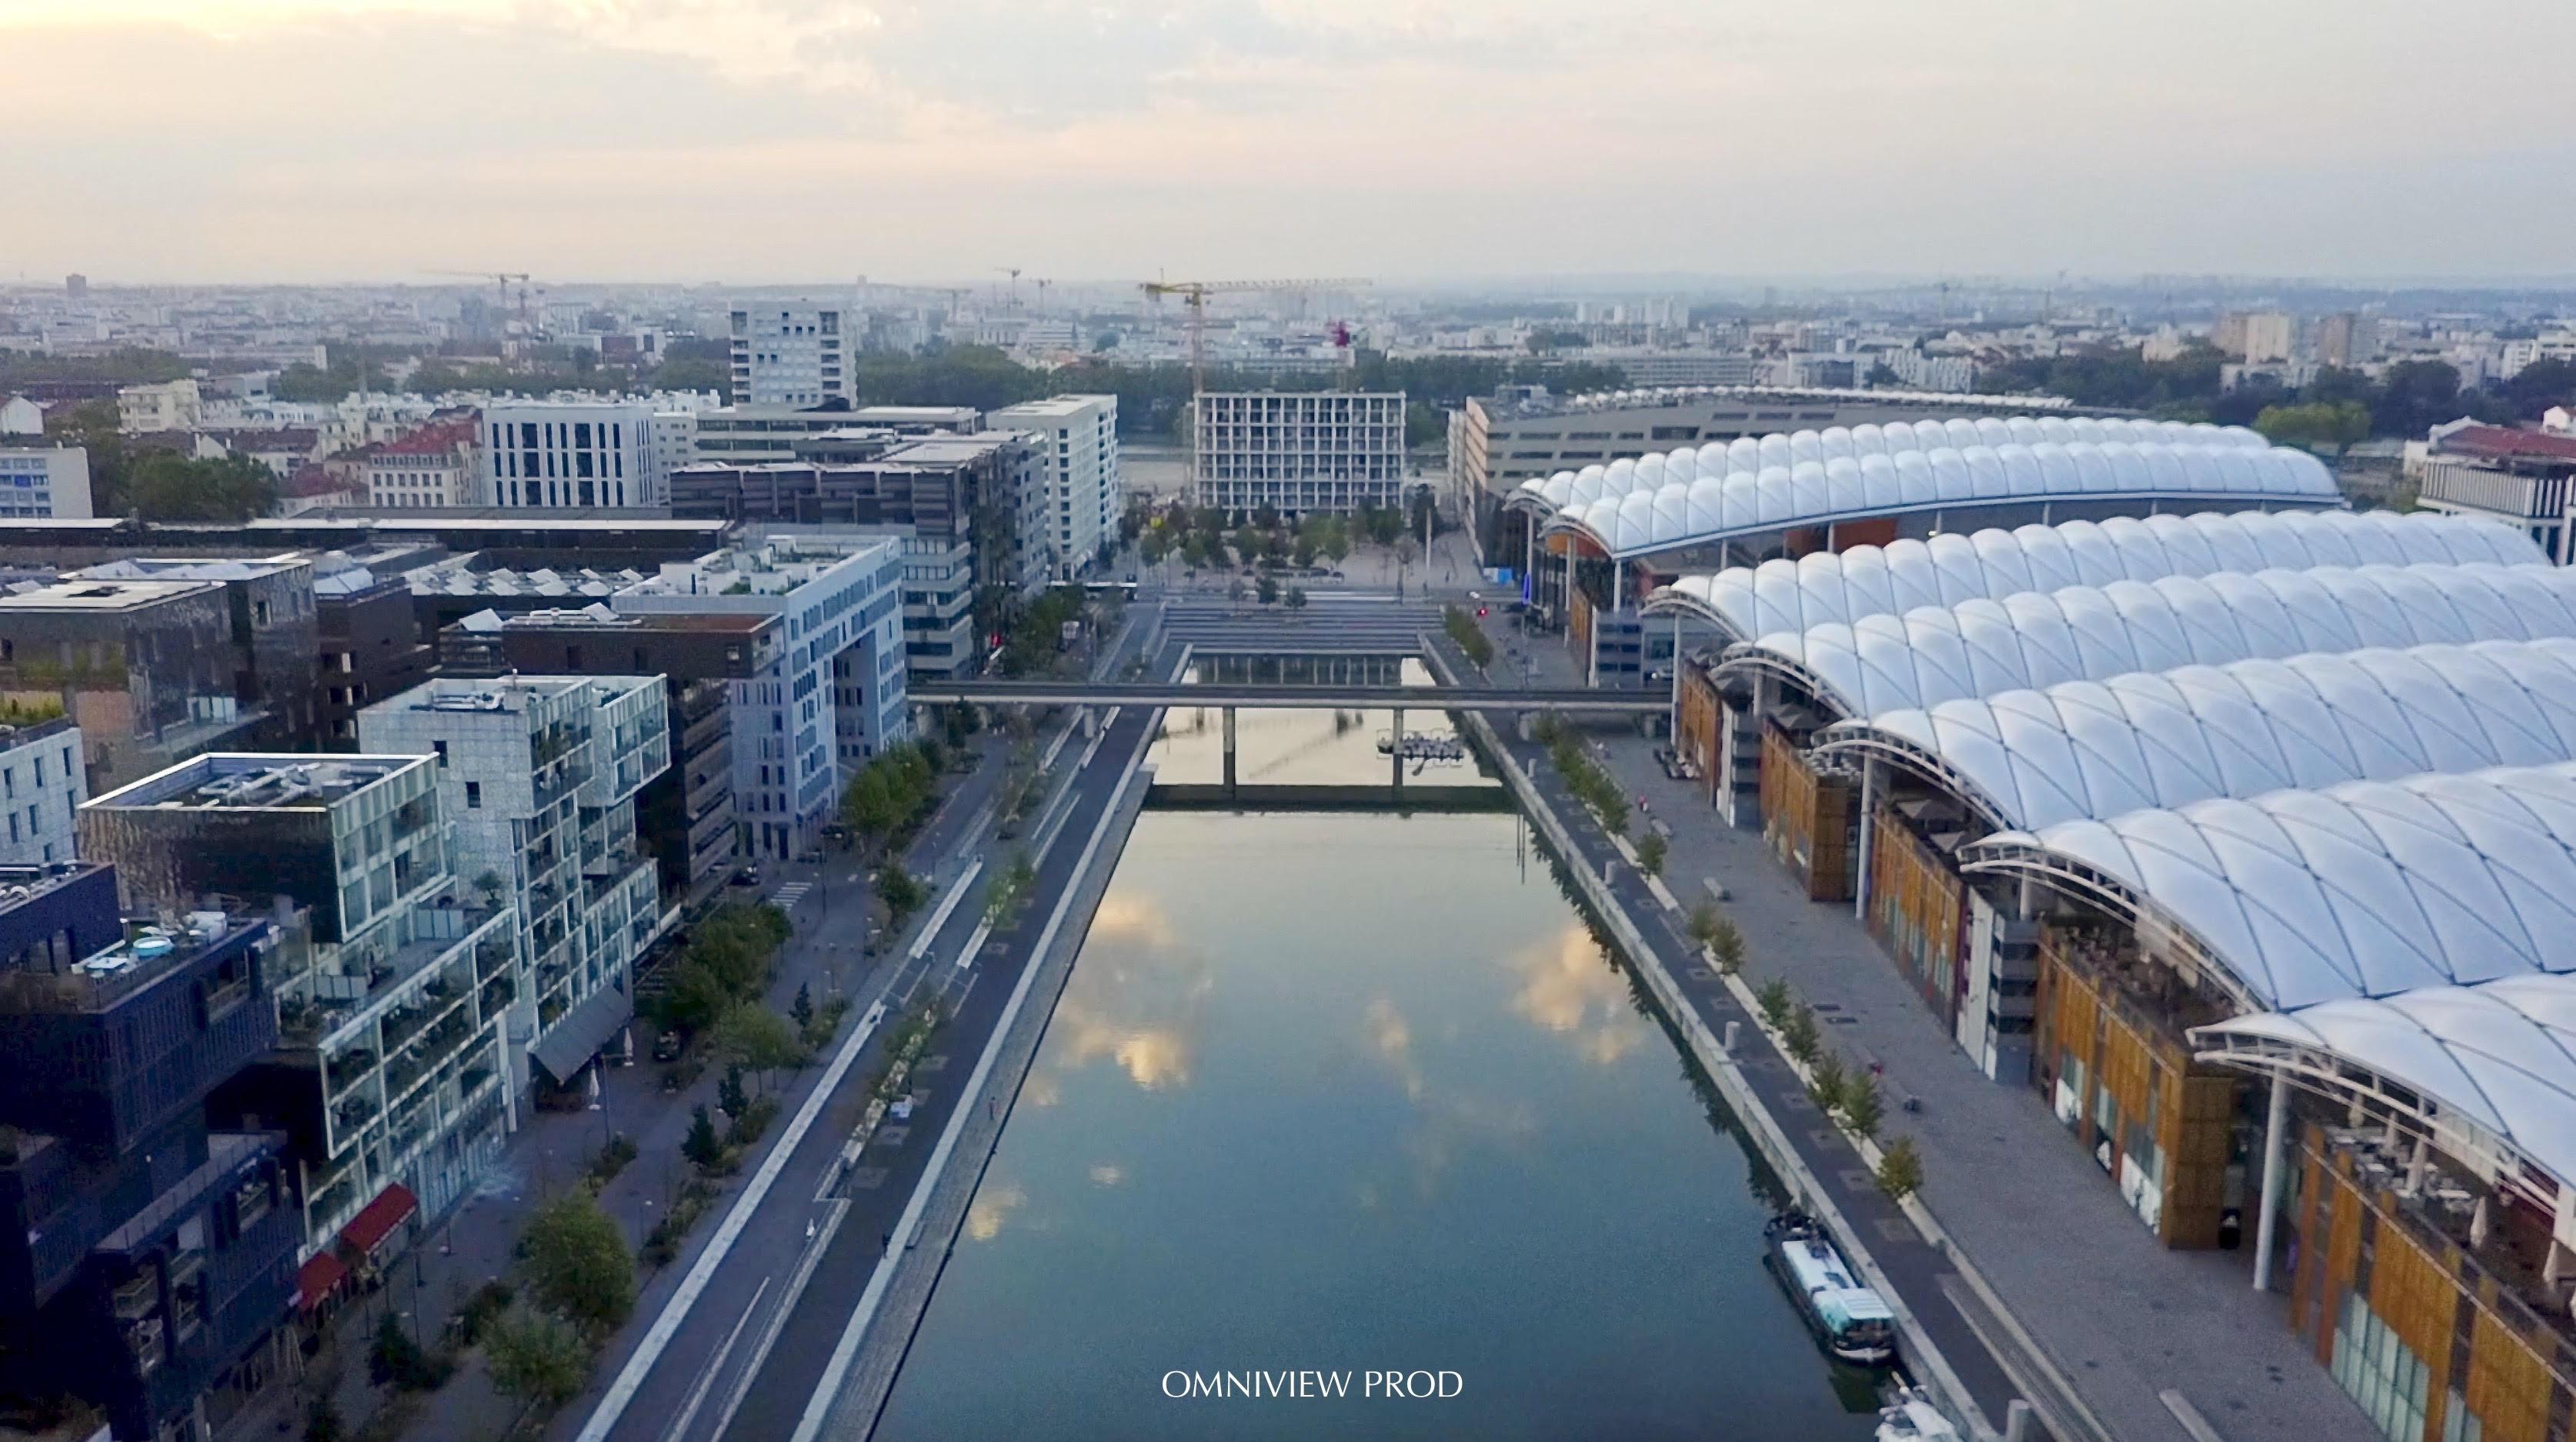 Confuences Lyon- photo drone- omniview prod